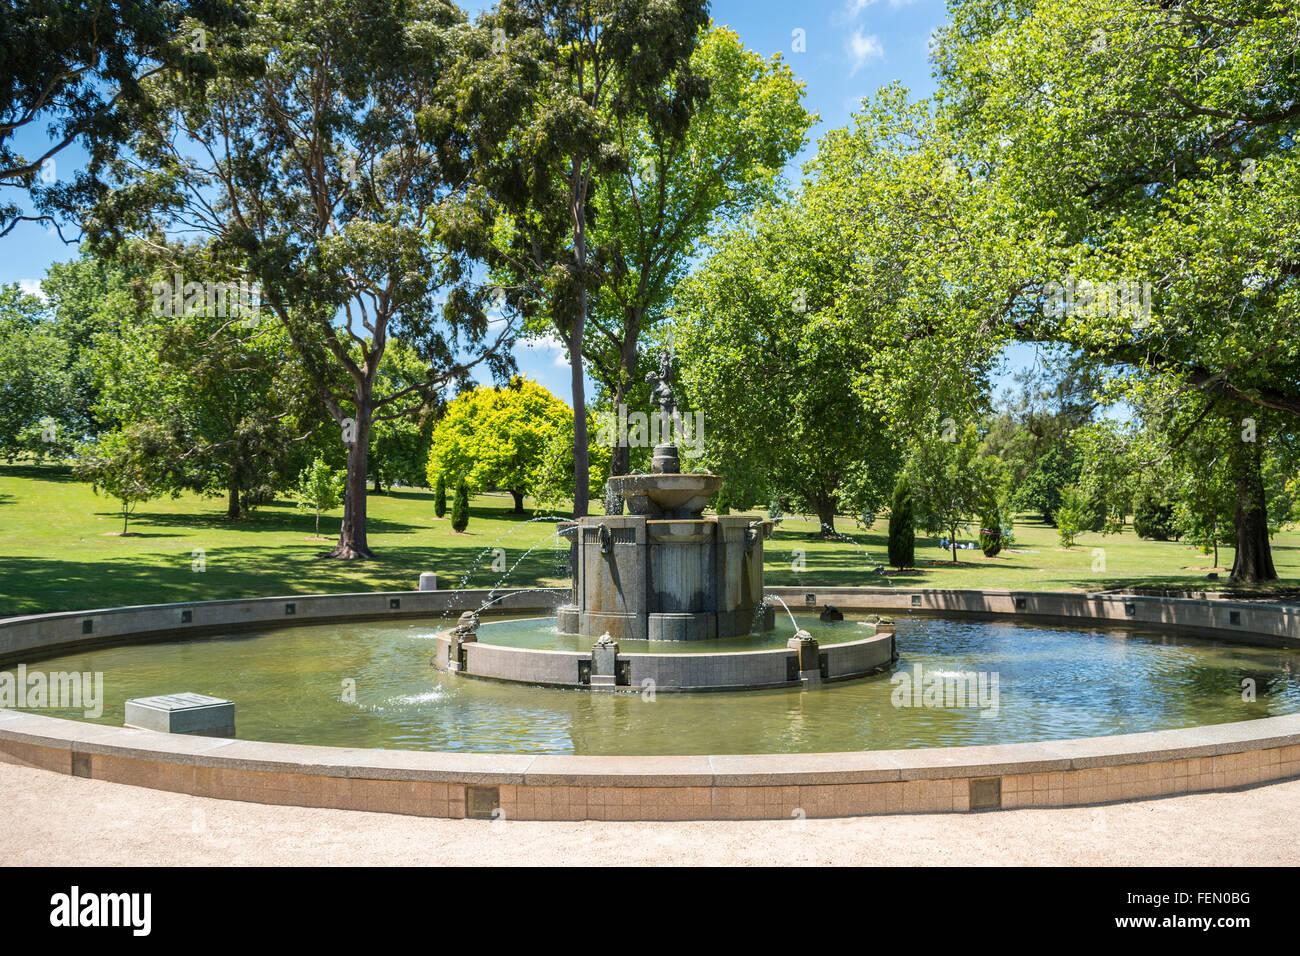 Robertson Fountain, Shrine of Remembrance, Melbourne, Australia - Stock Image